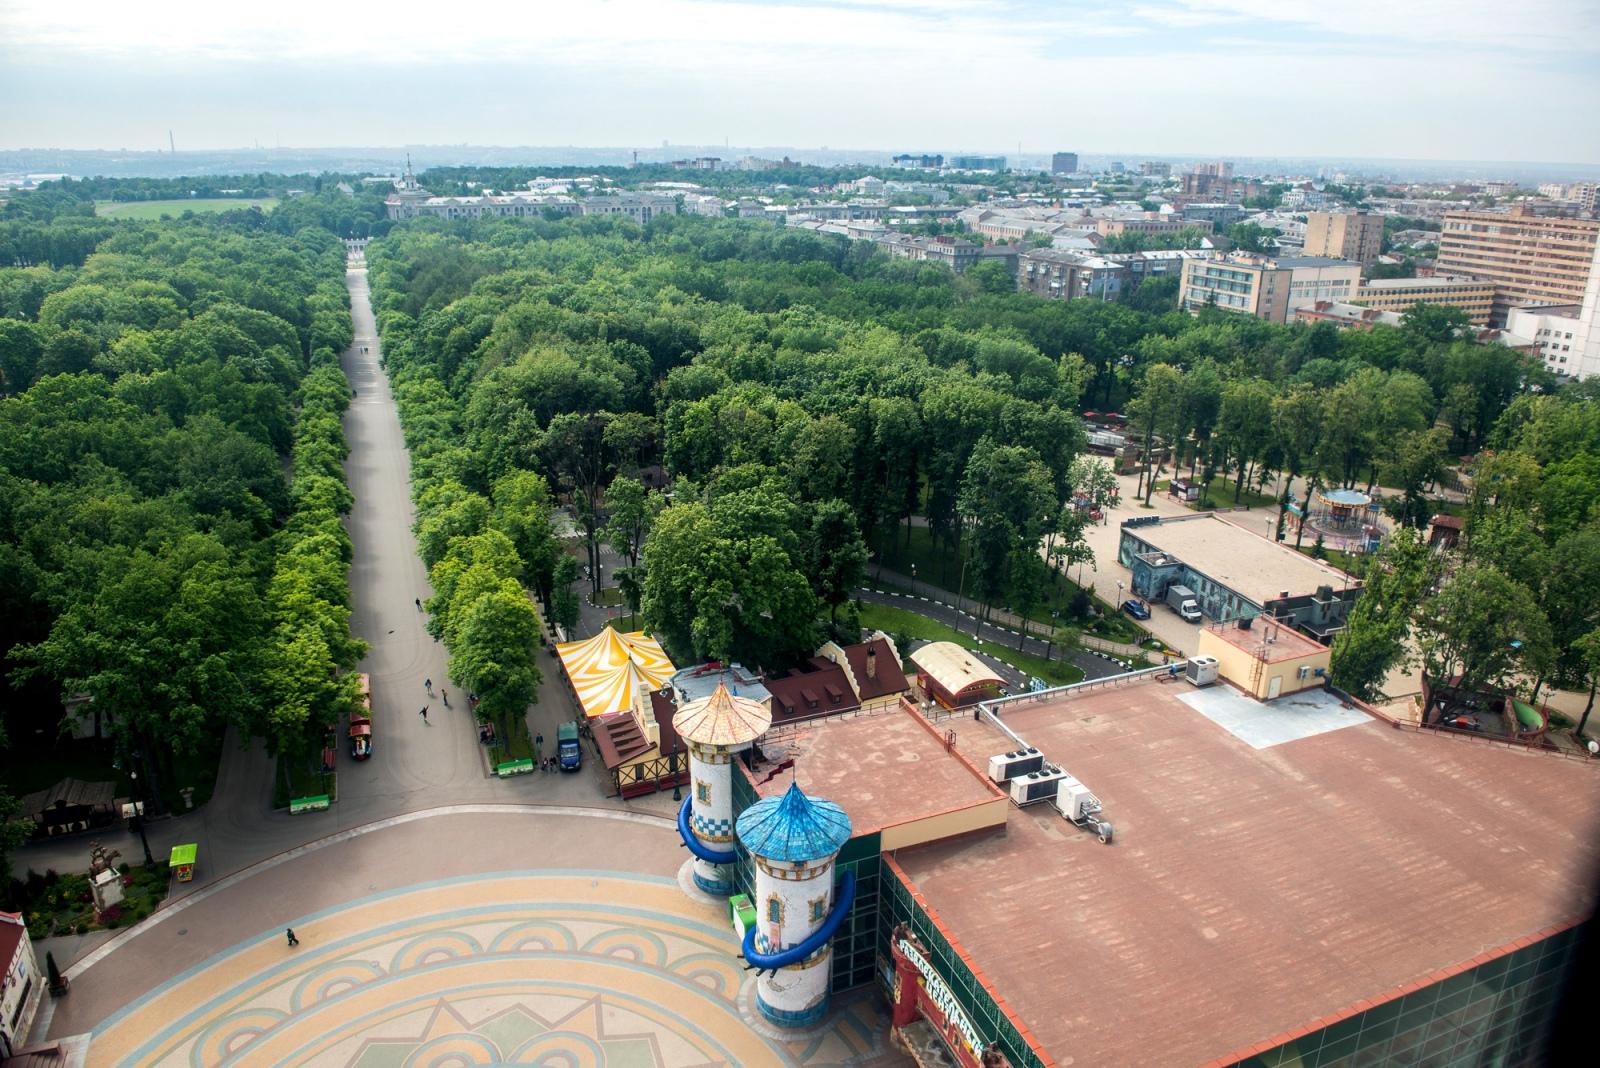 http://img.pravda.com/images/doc/d/f/df69ea6-kharkiv-panorama.jpg